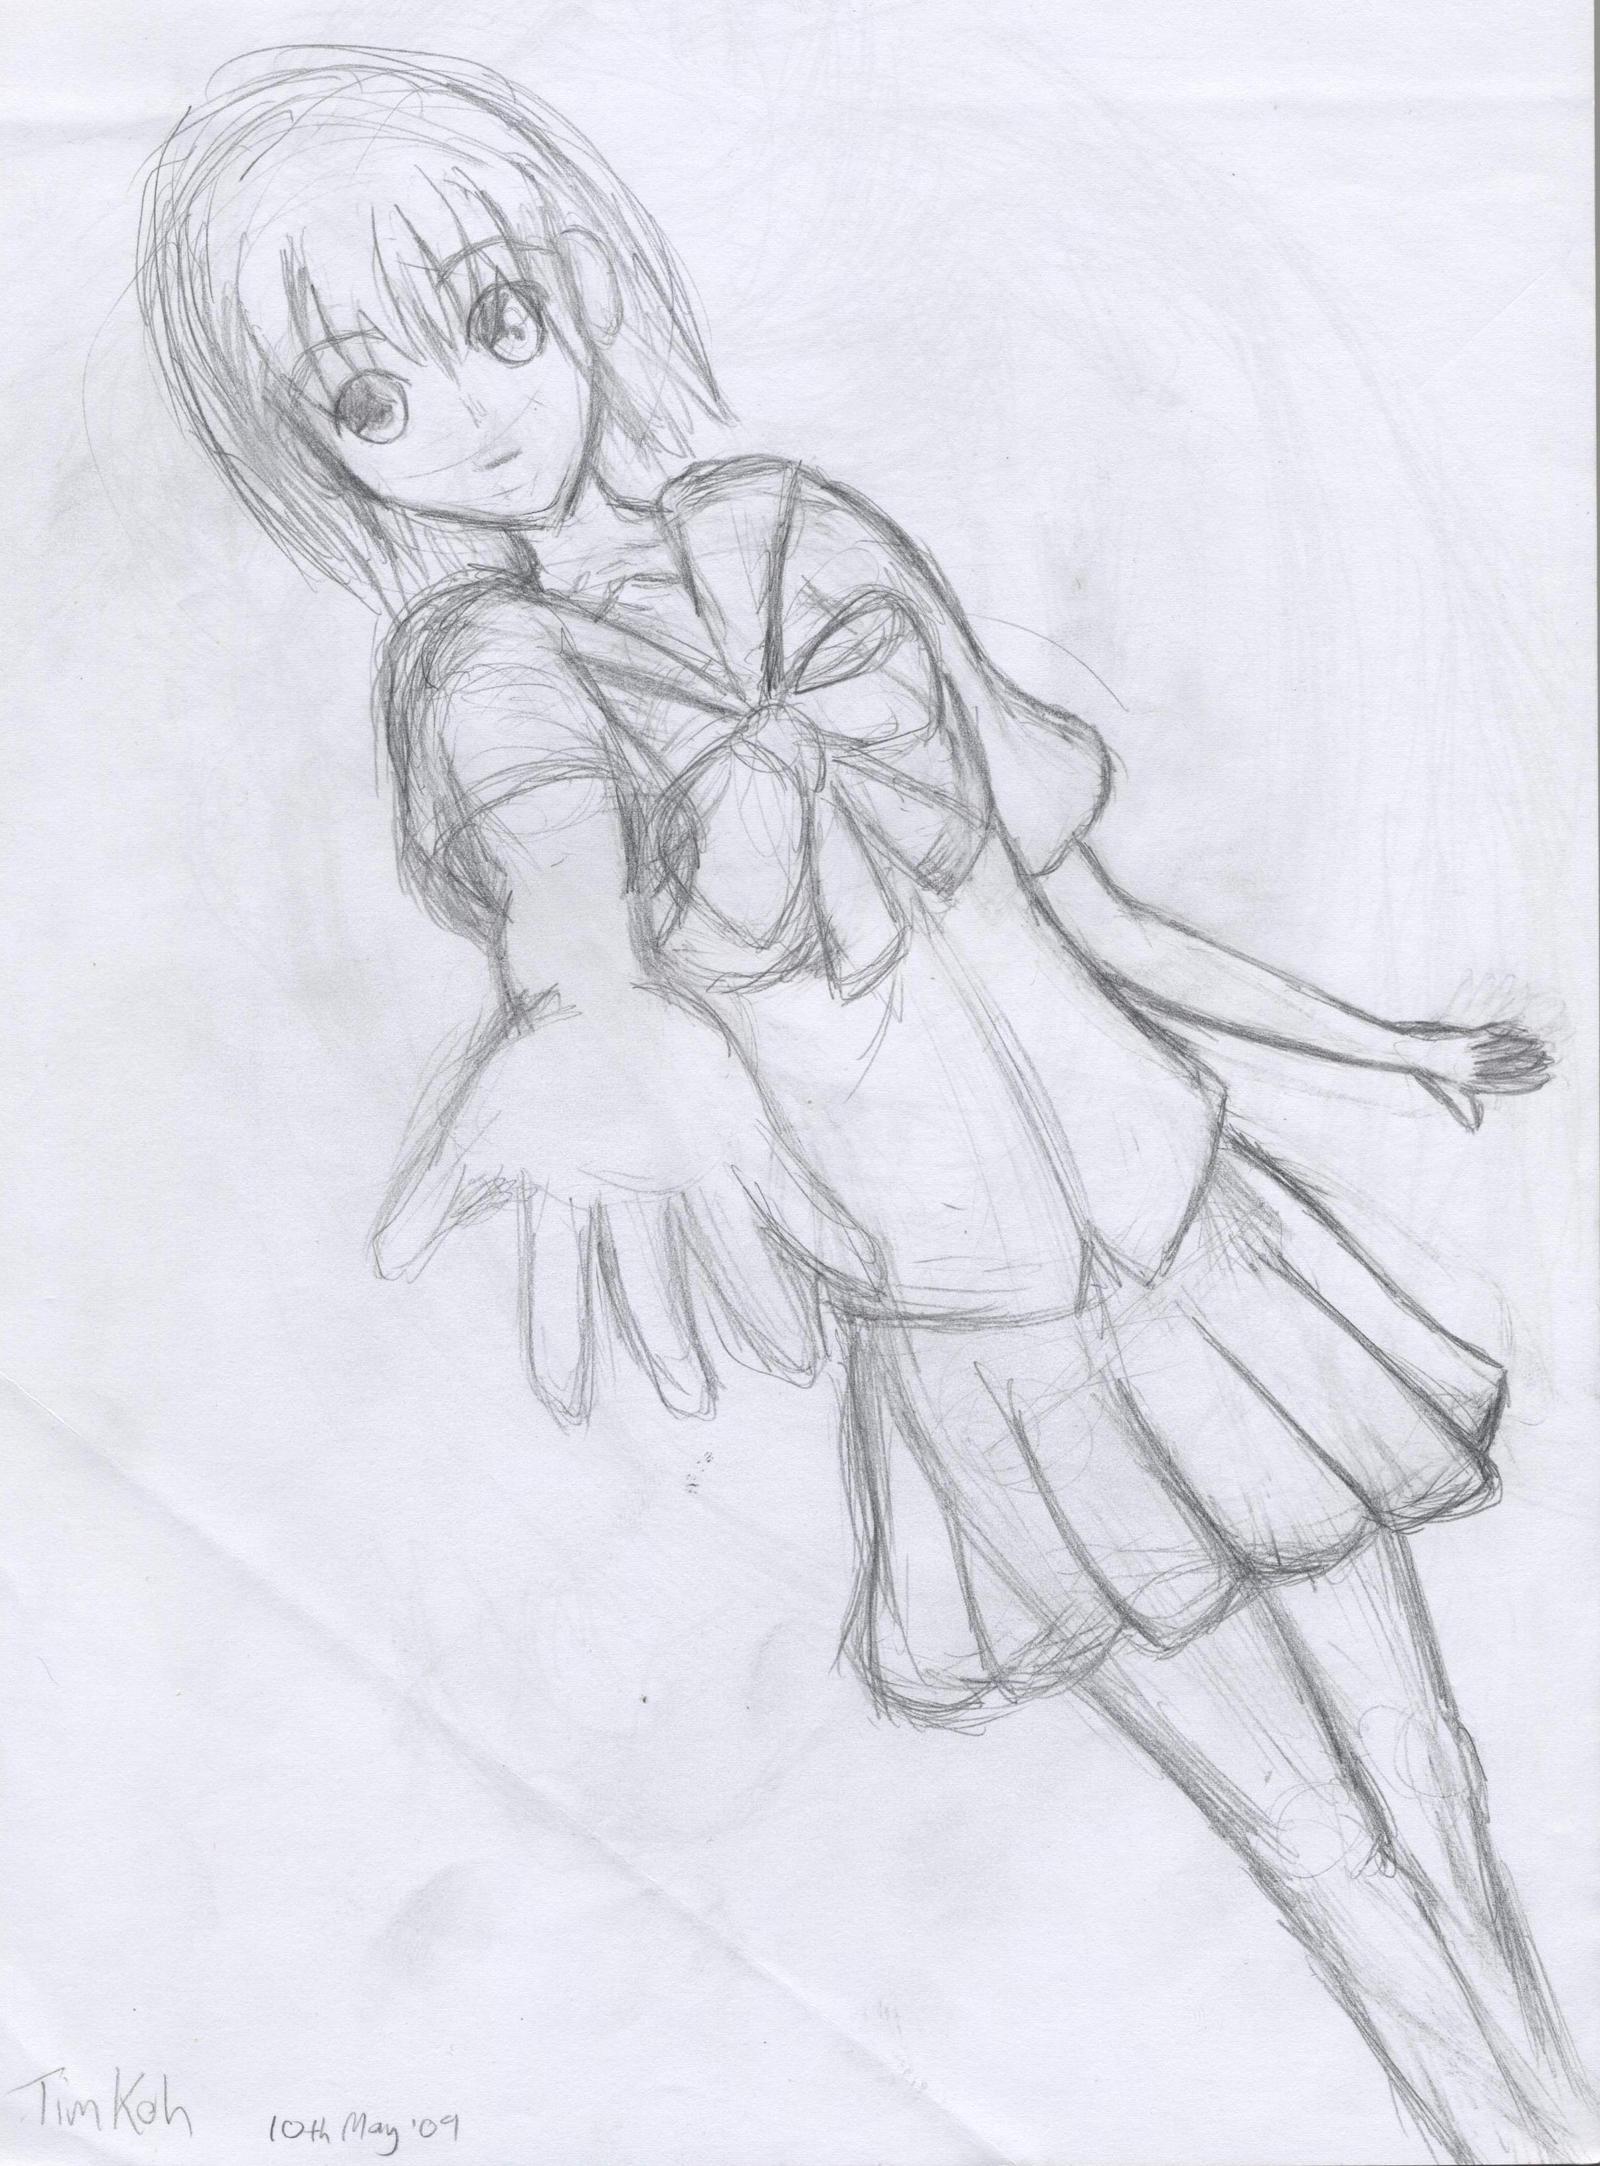 girl reaching out by raptor-tk on DeviantArt